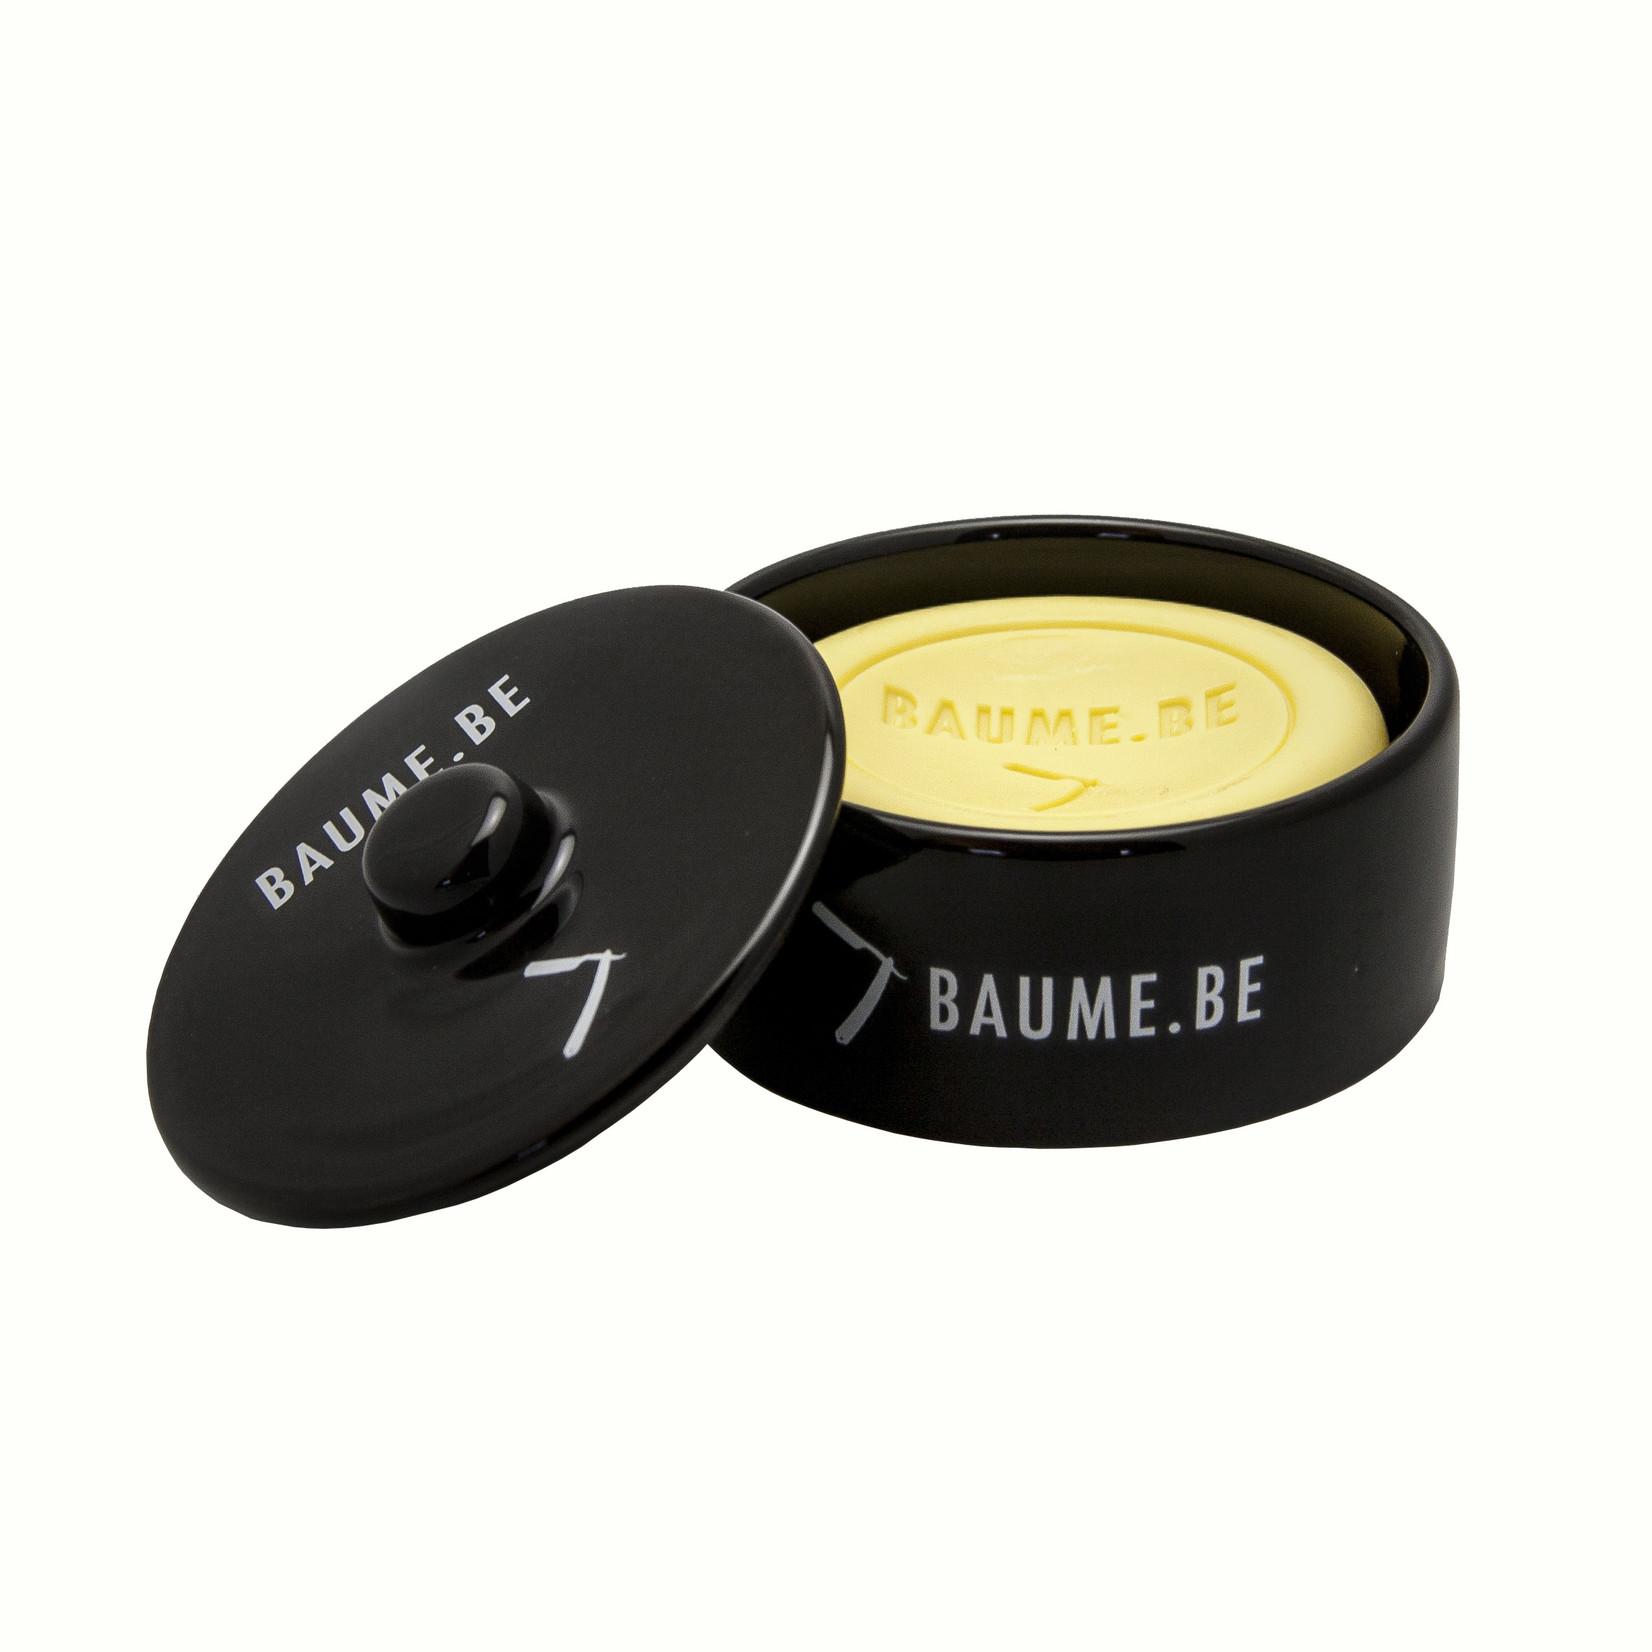 BAUME.BE BAUME.BE · SCHEERZEEP with CERAMIC JAR